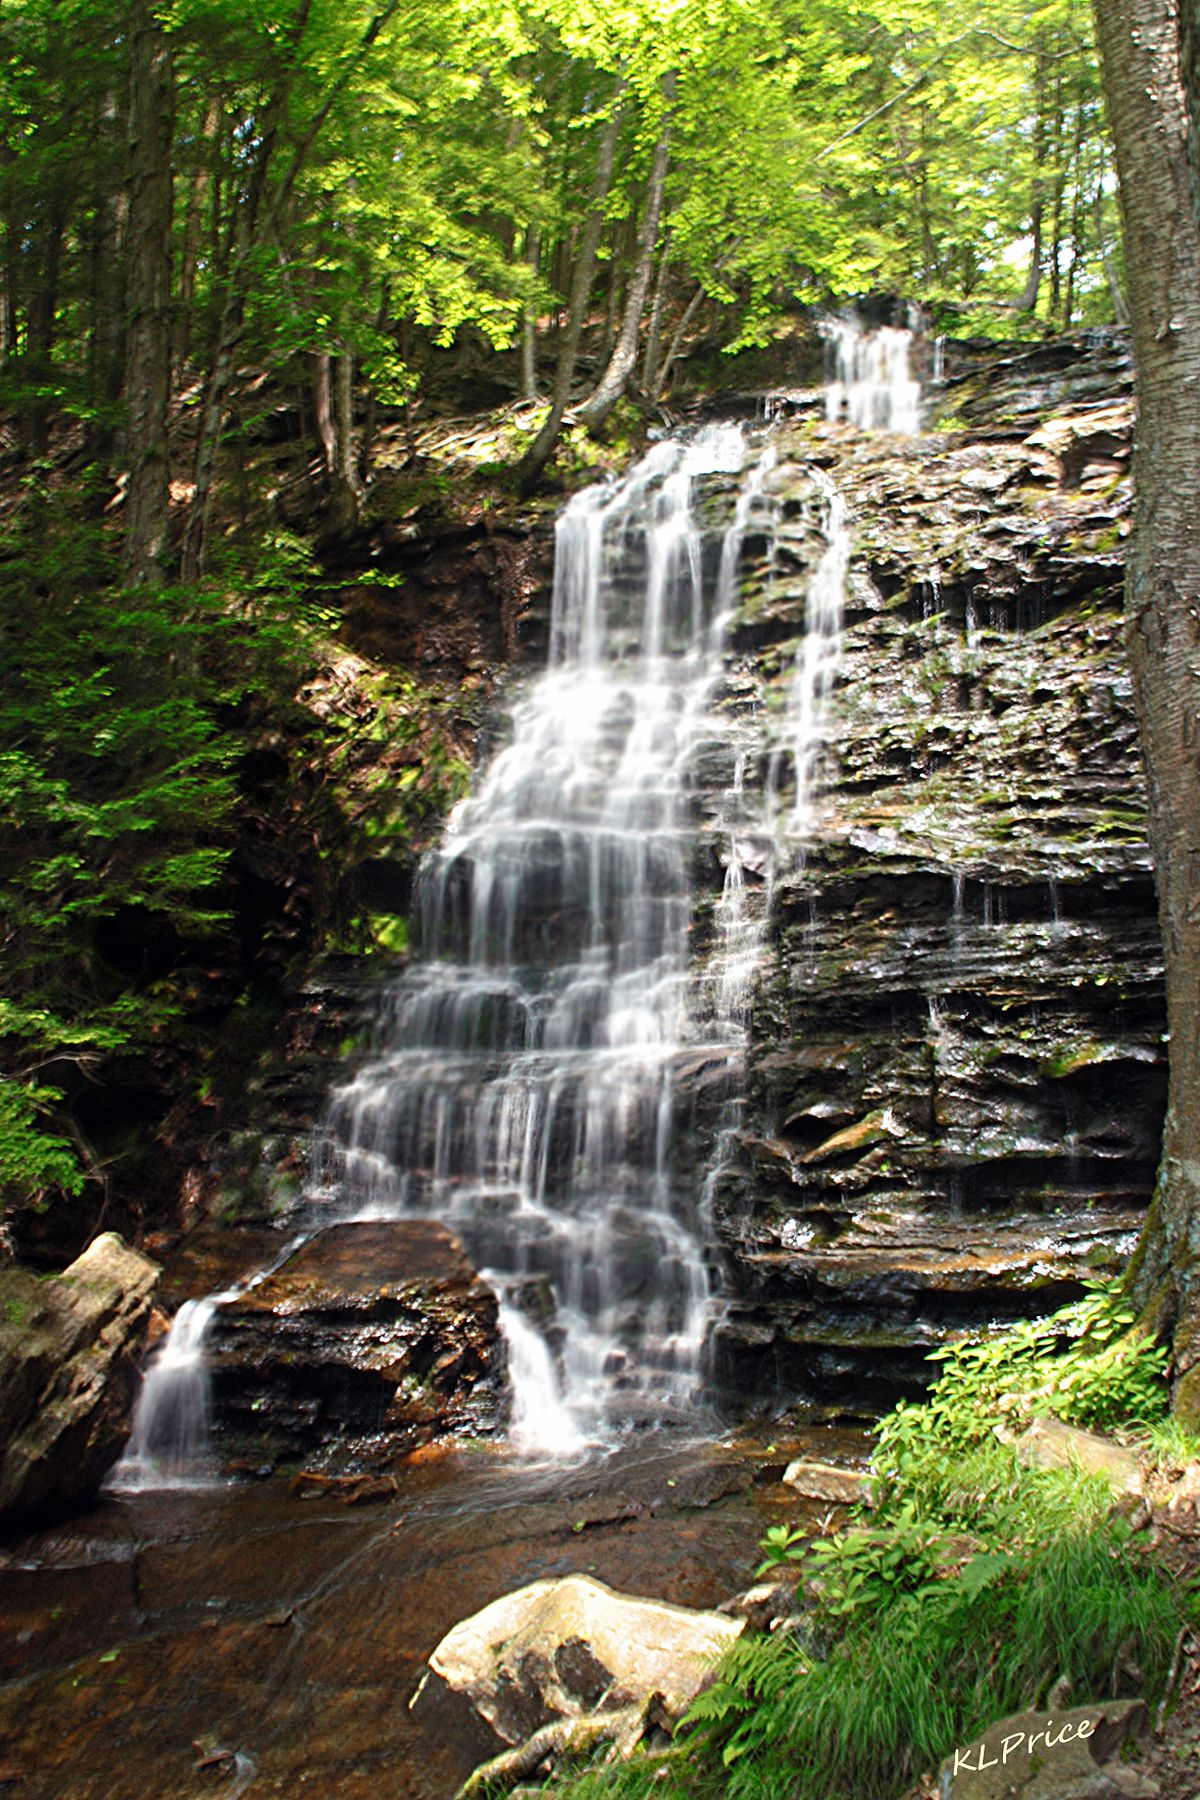 Bear Creek Pa >> Bear Creek Falls Off Of White Haven Rd In Bear Creek